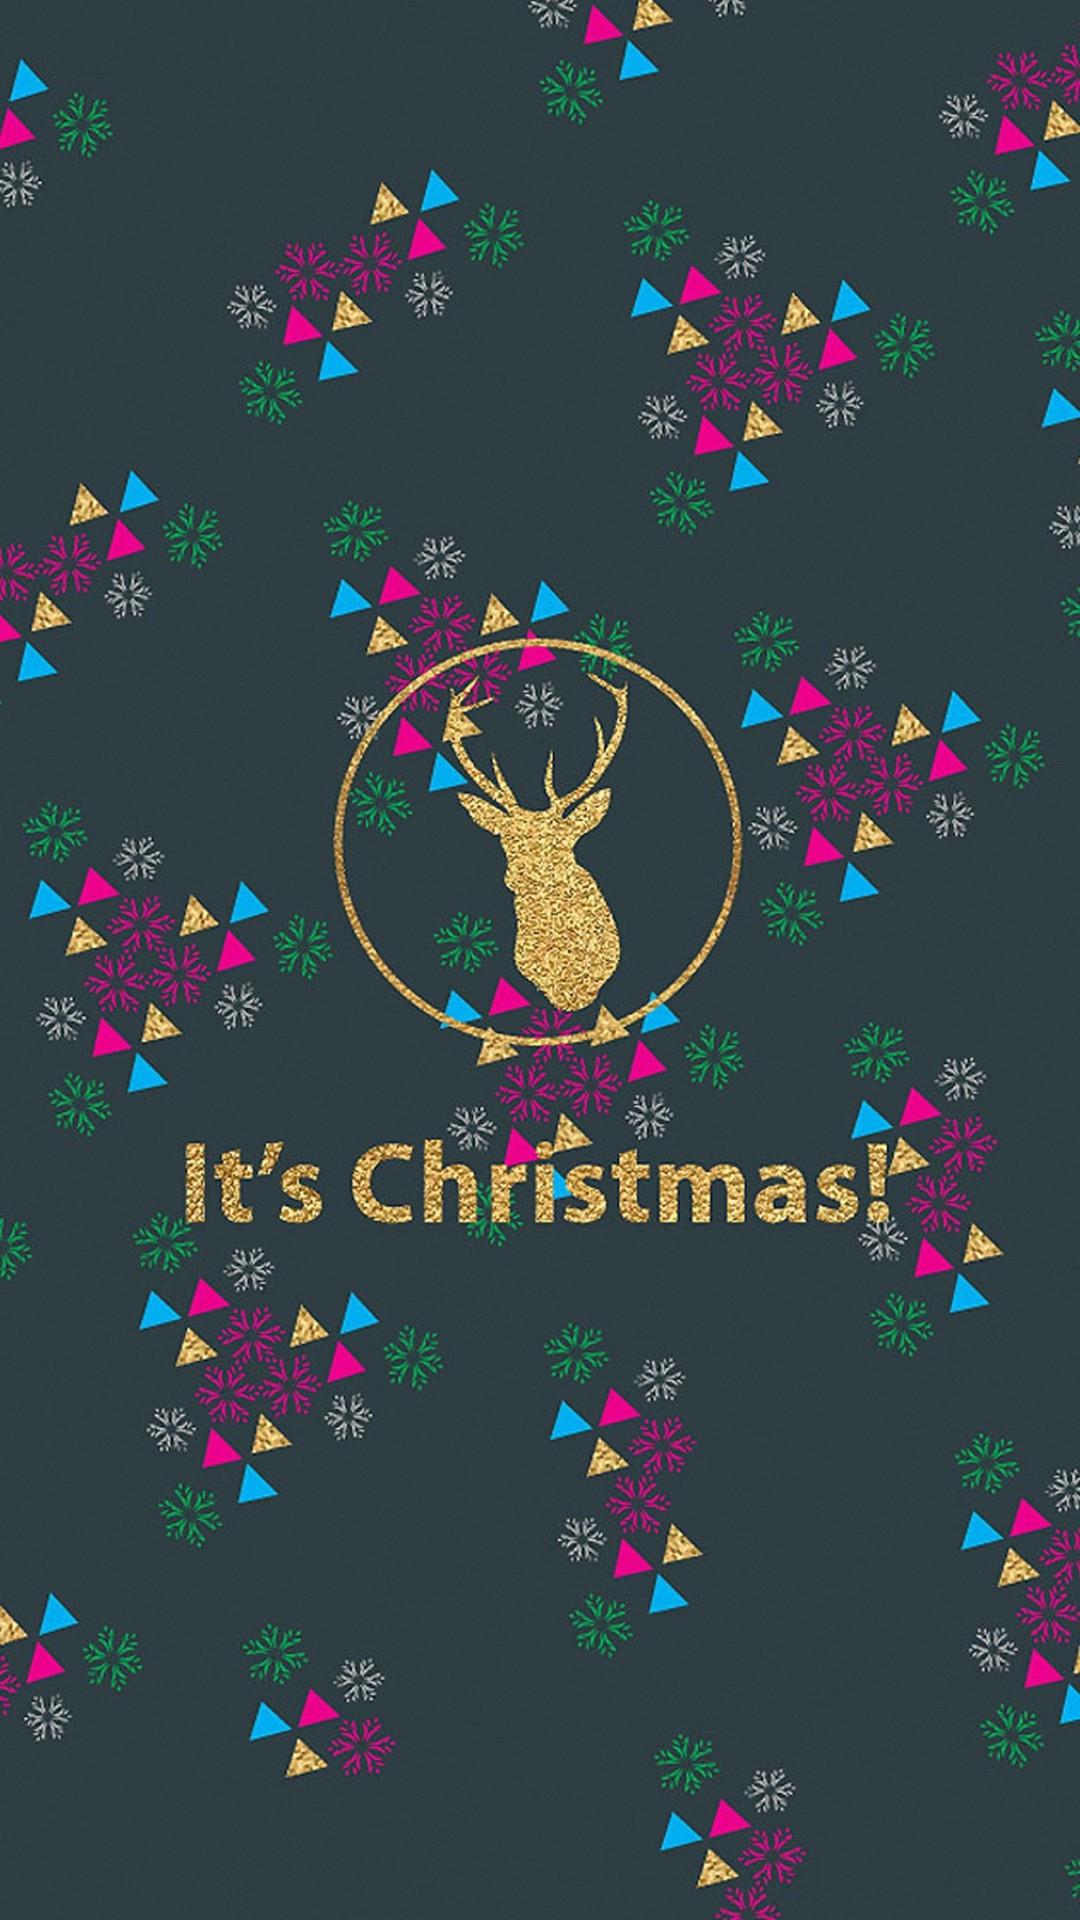 Christmas Phone Wallpaper Download Free Beautiful